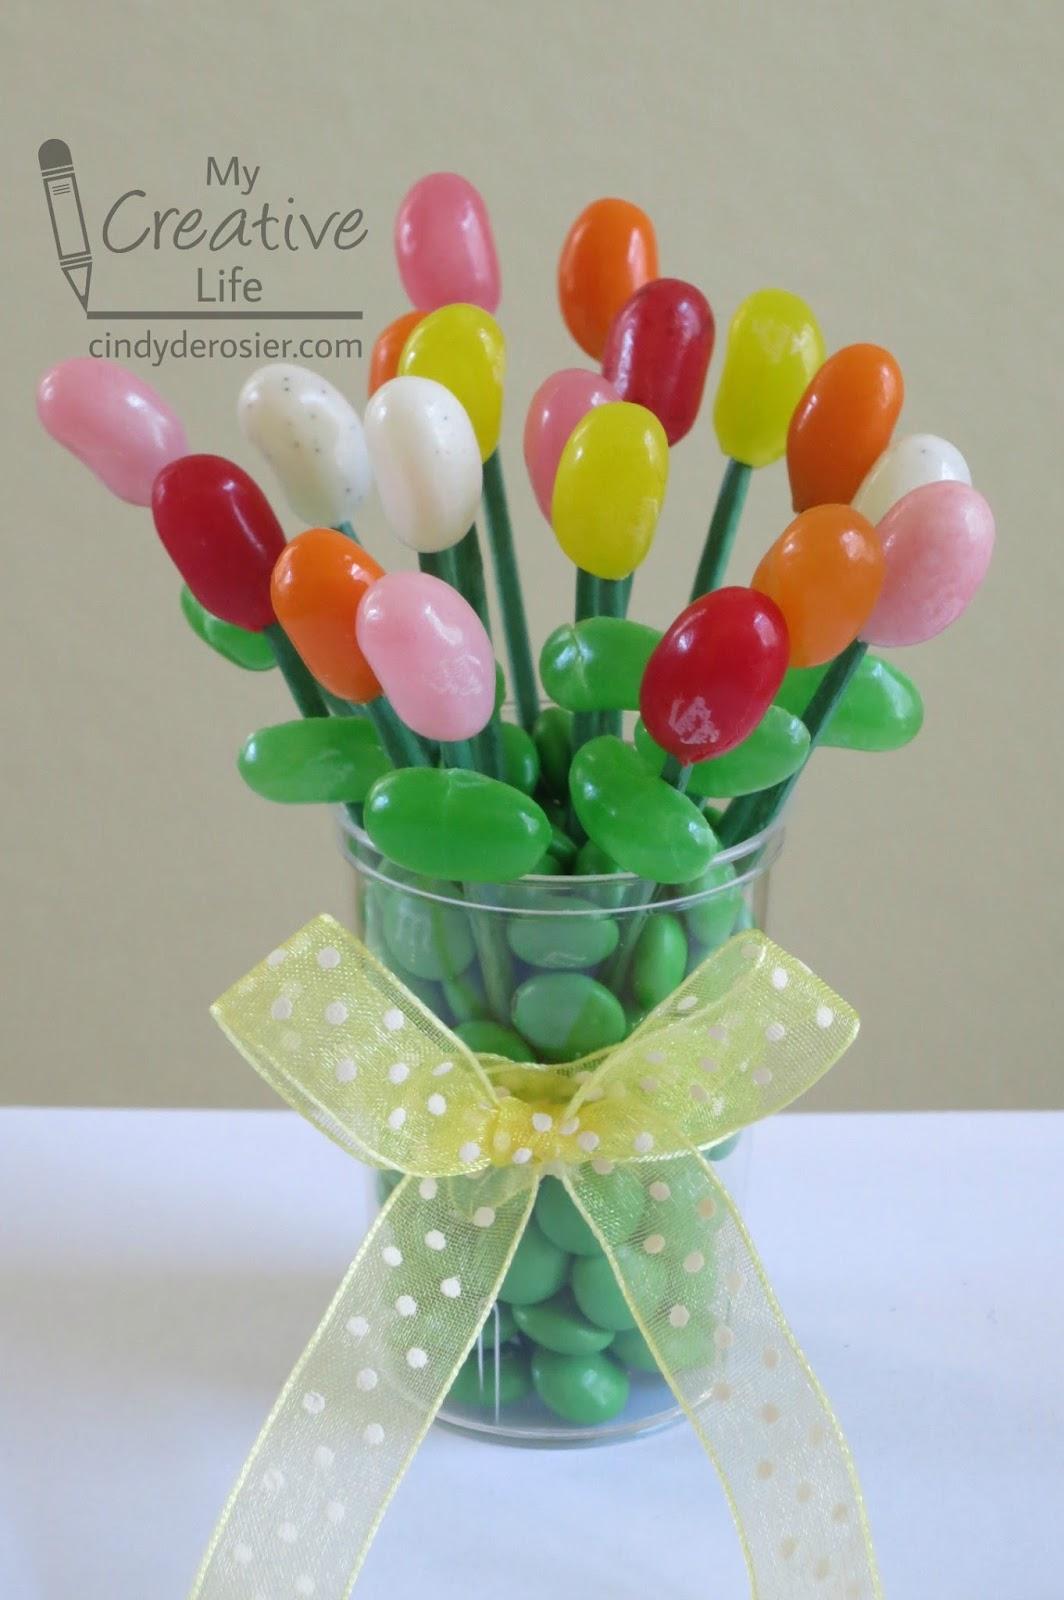 Cindy deRosier: My Creative Life: Miniature Edible Jelly Bean Bouquet